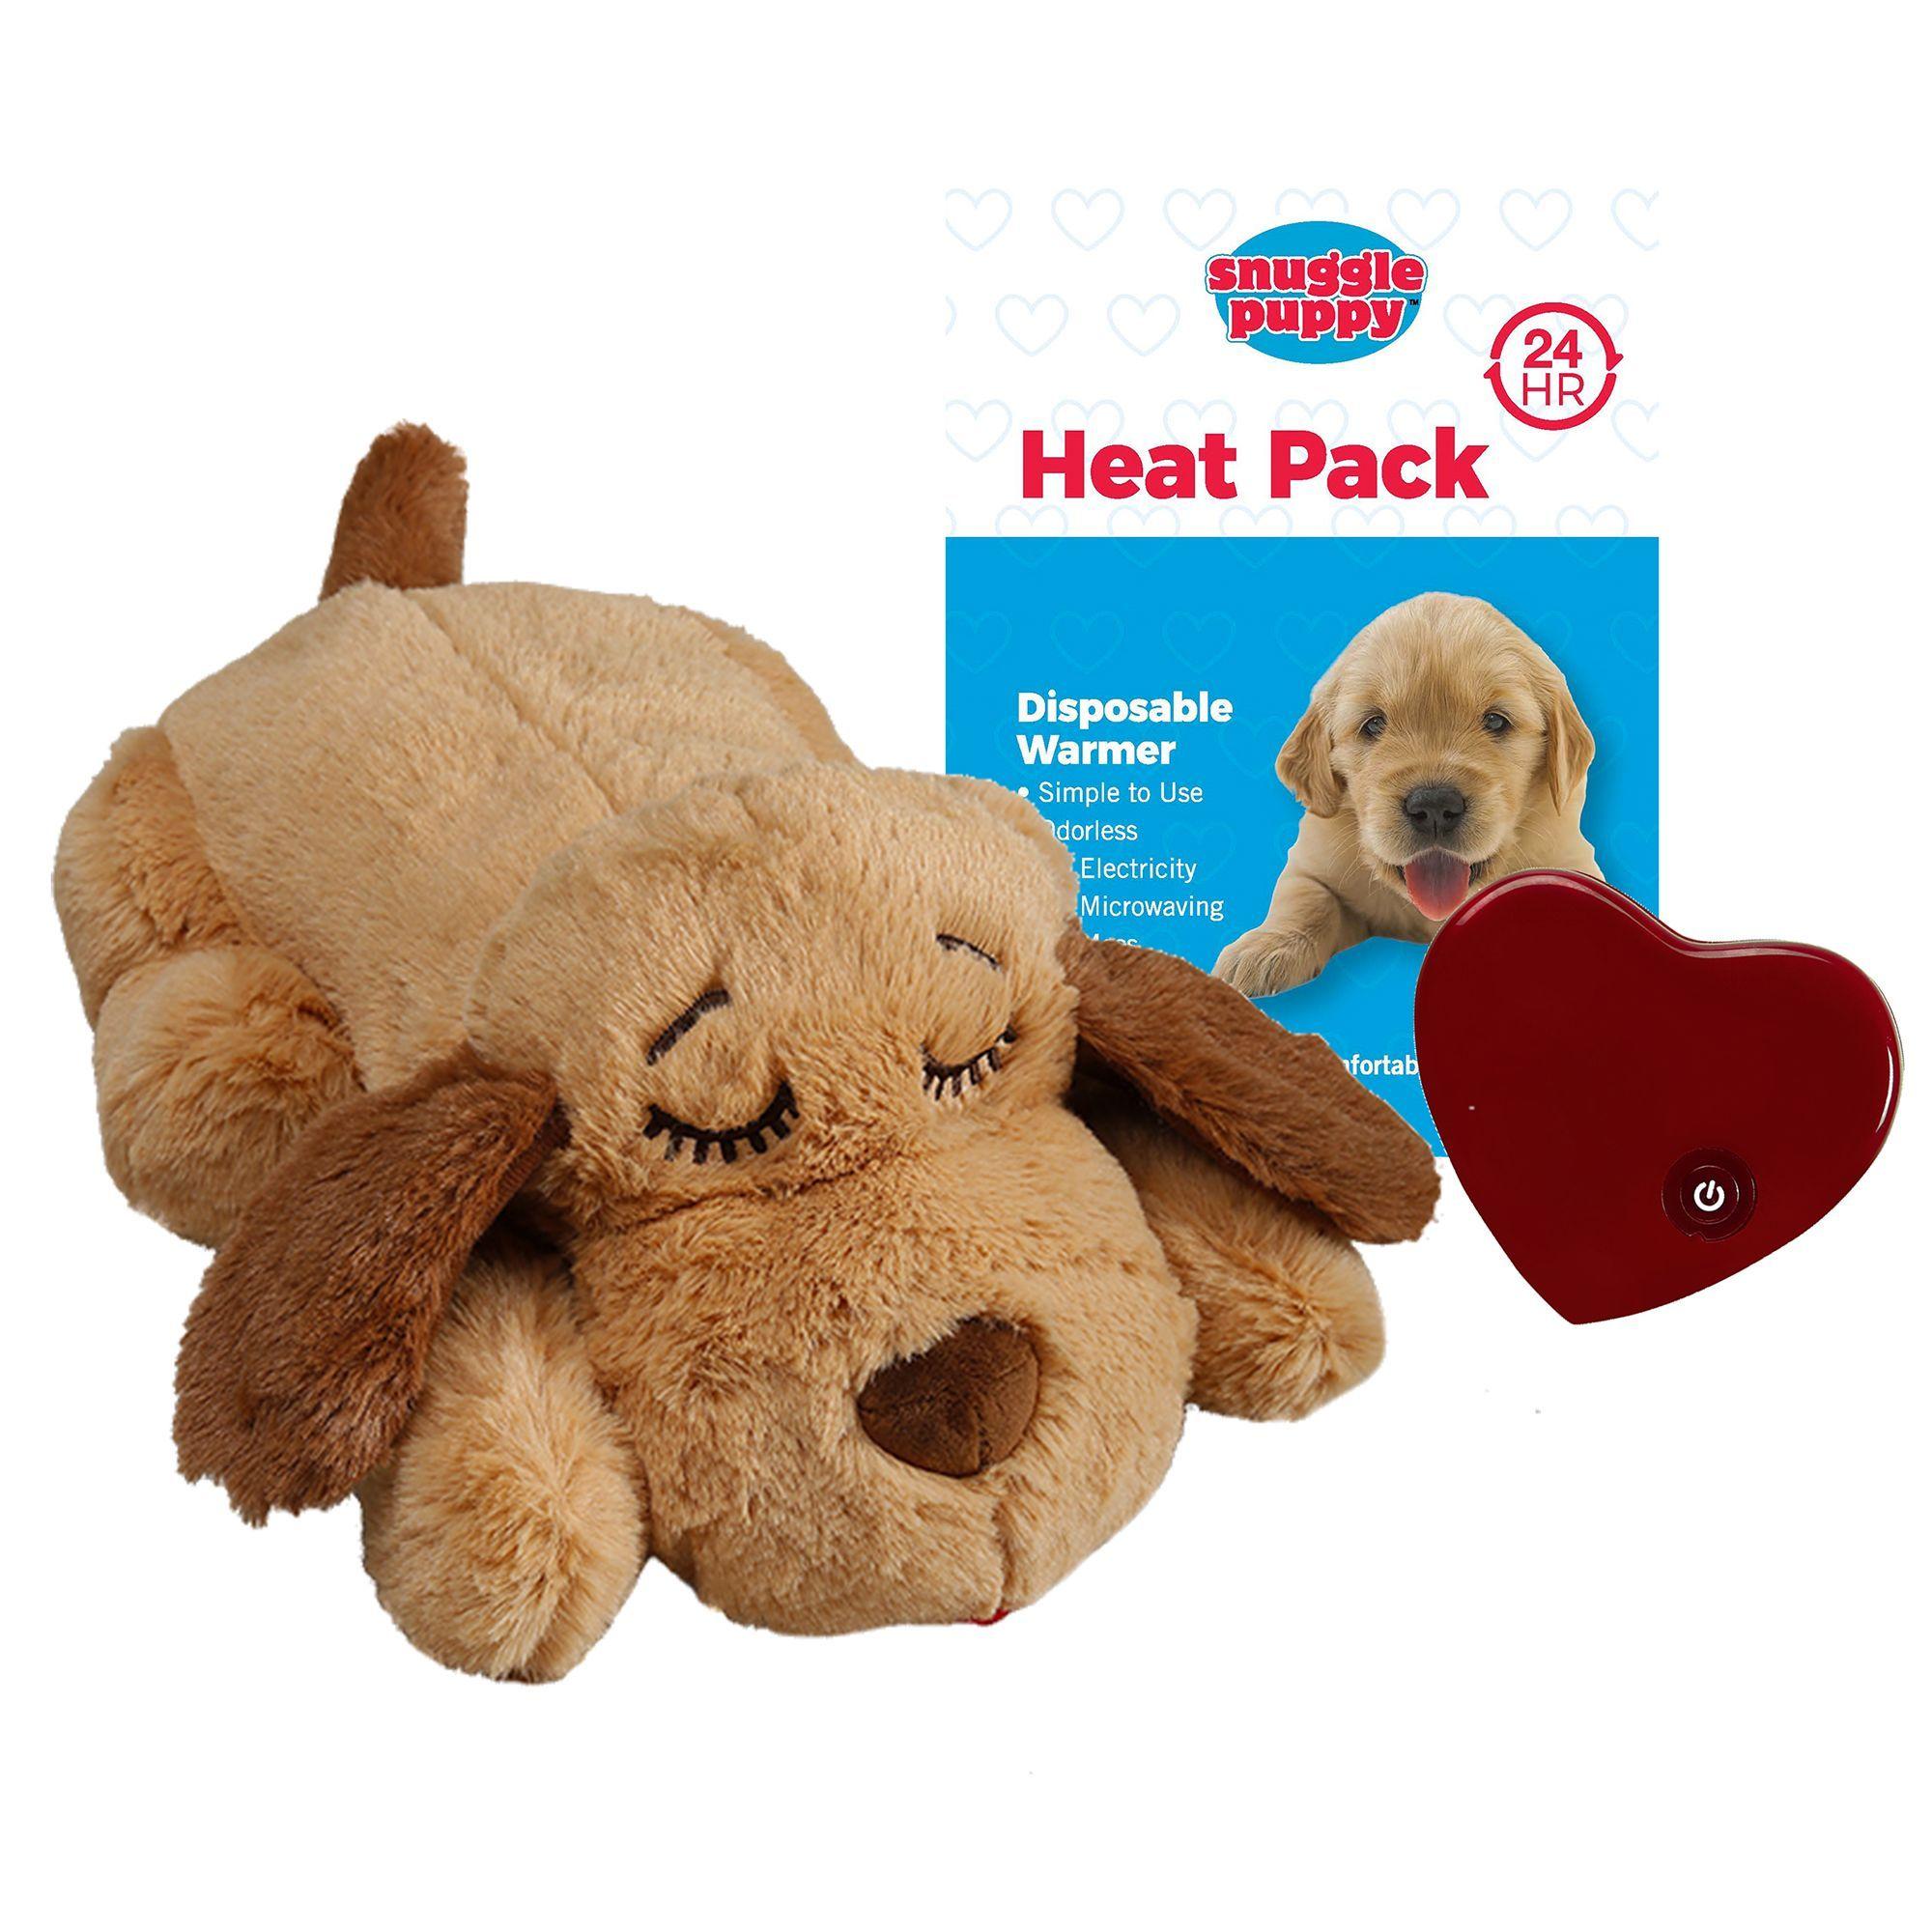 Smart Pet Love Snuggle Puppy Behavioral Aid Dog Toy Black